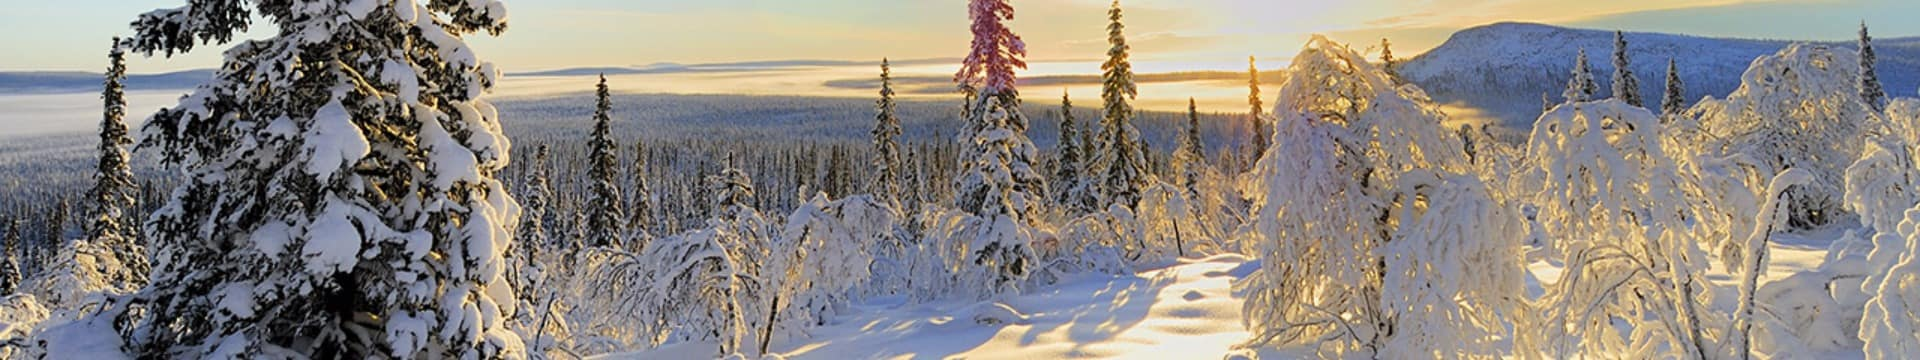 Vista em reserva natural da Lapônia, Finlândia.